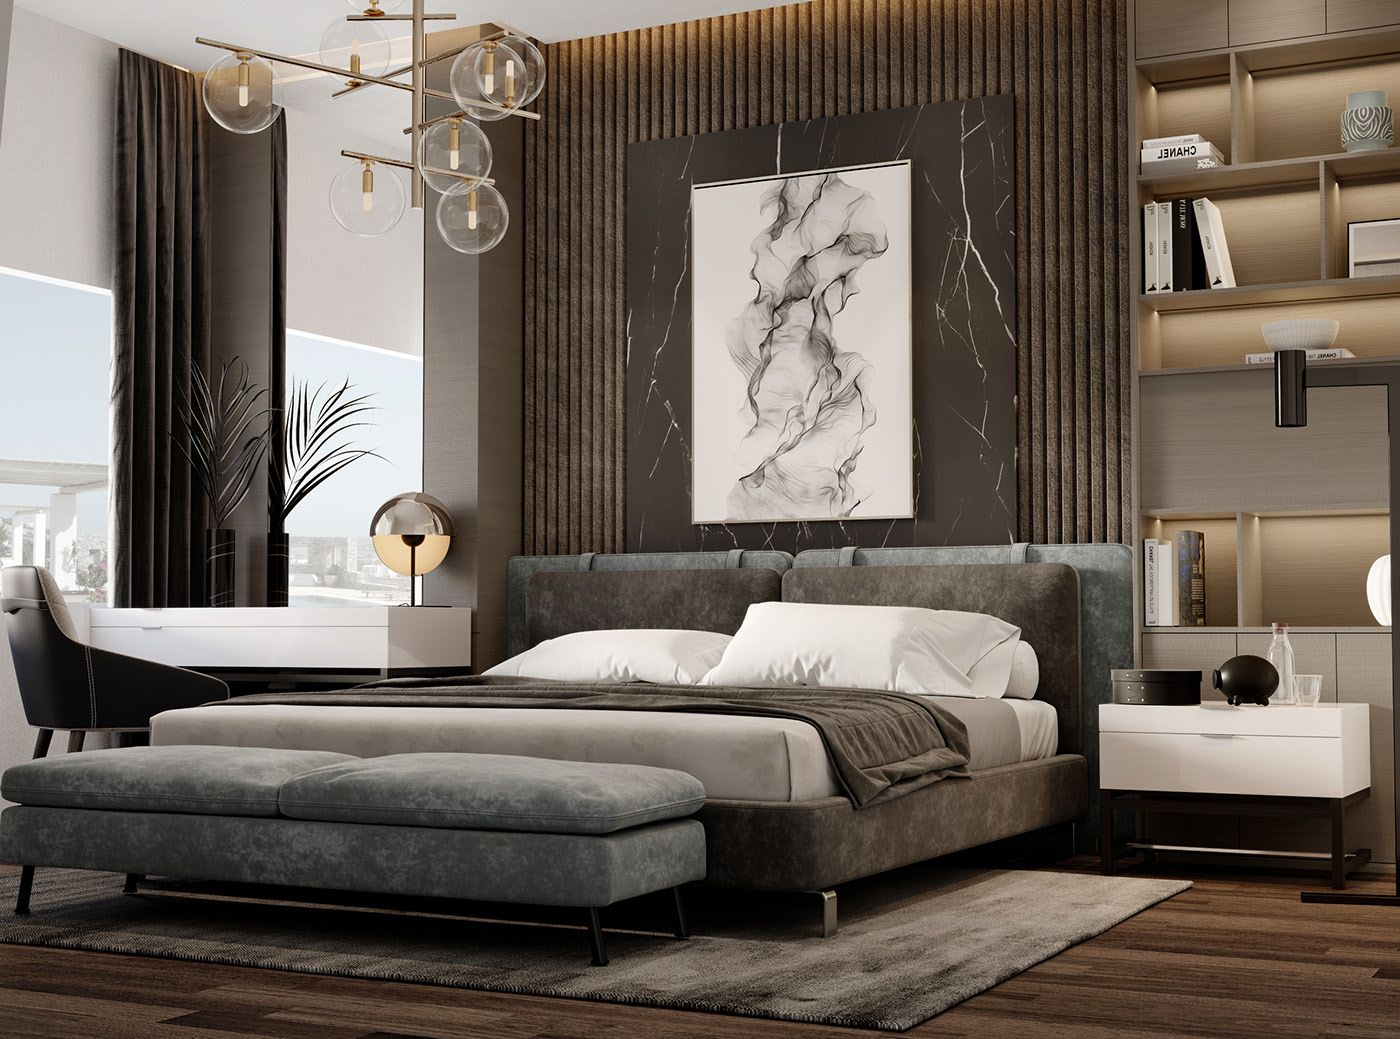 Luxury Bedroom Design In Jeddah On Behance Luxurious Bedrooms Modern Luxury Bedroom Country Bedroom Design Minimalist luxury bedroom photo